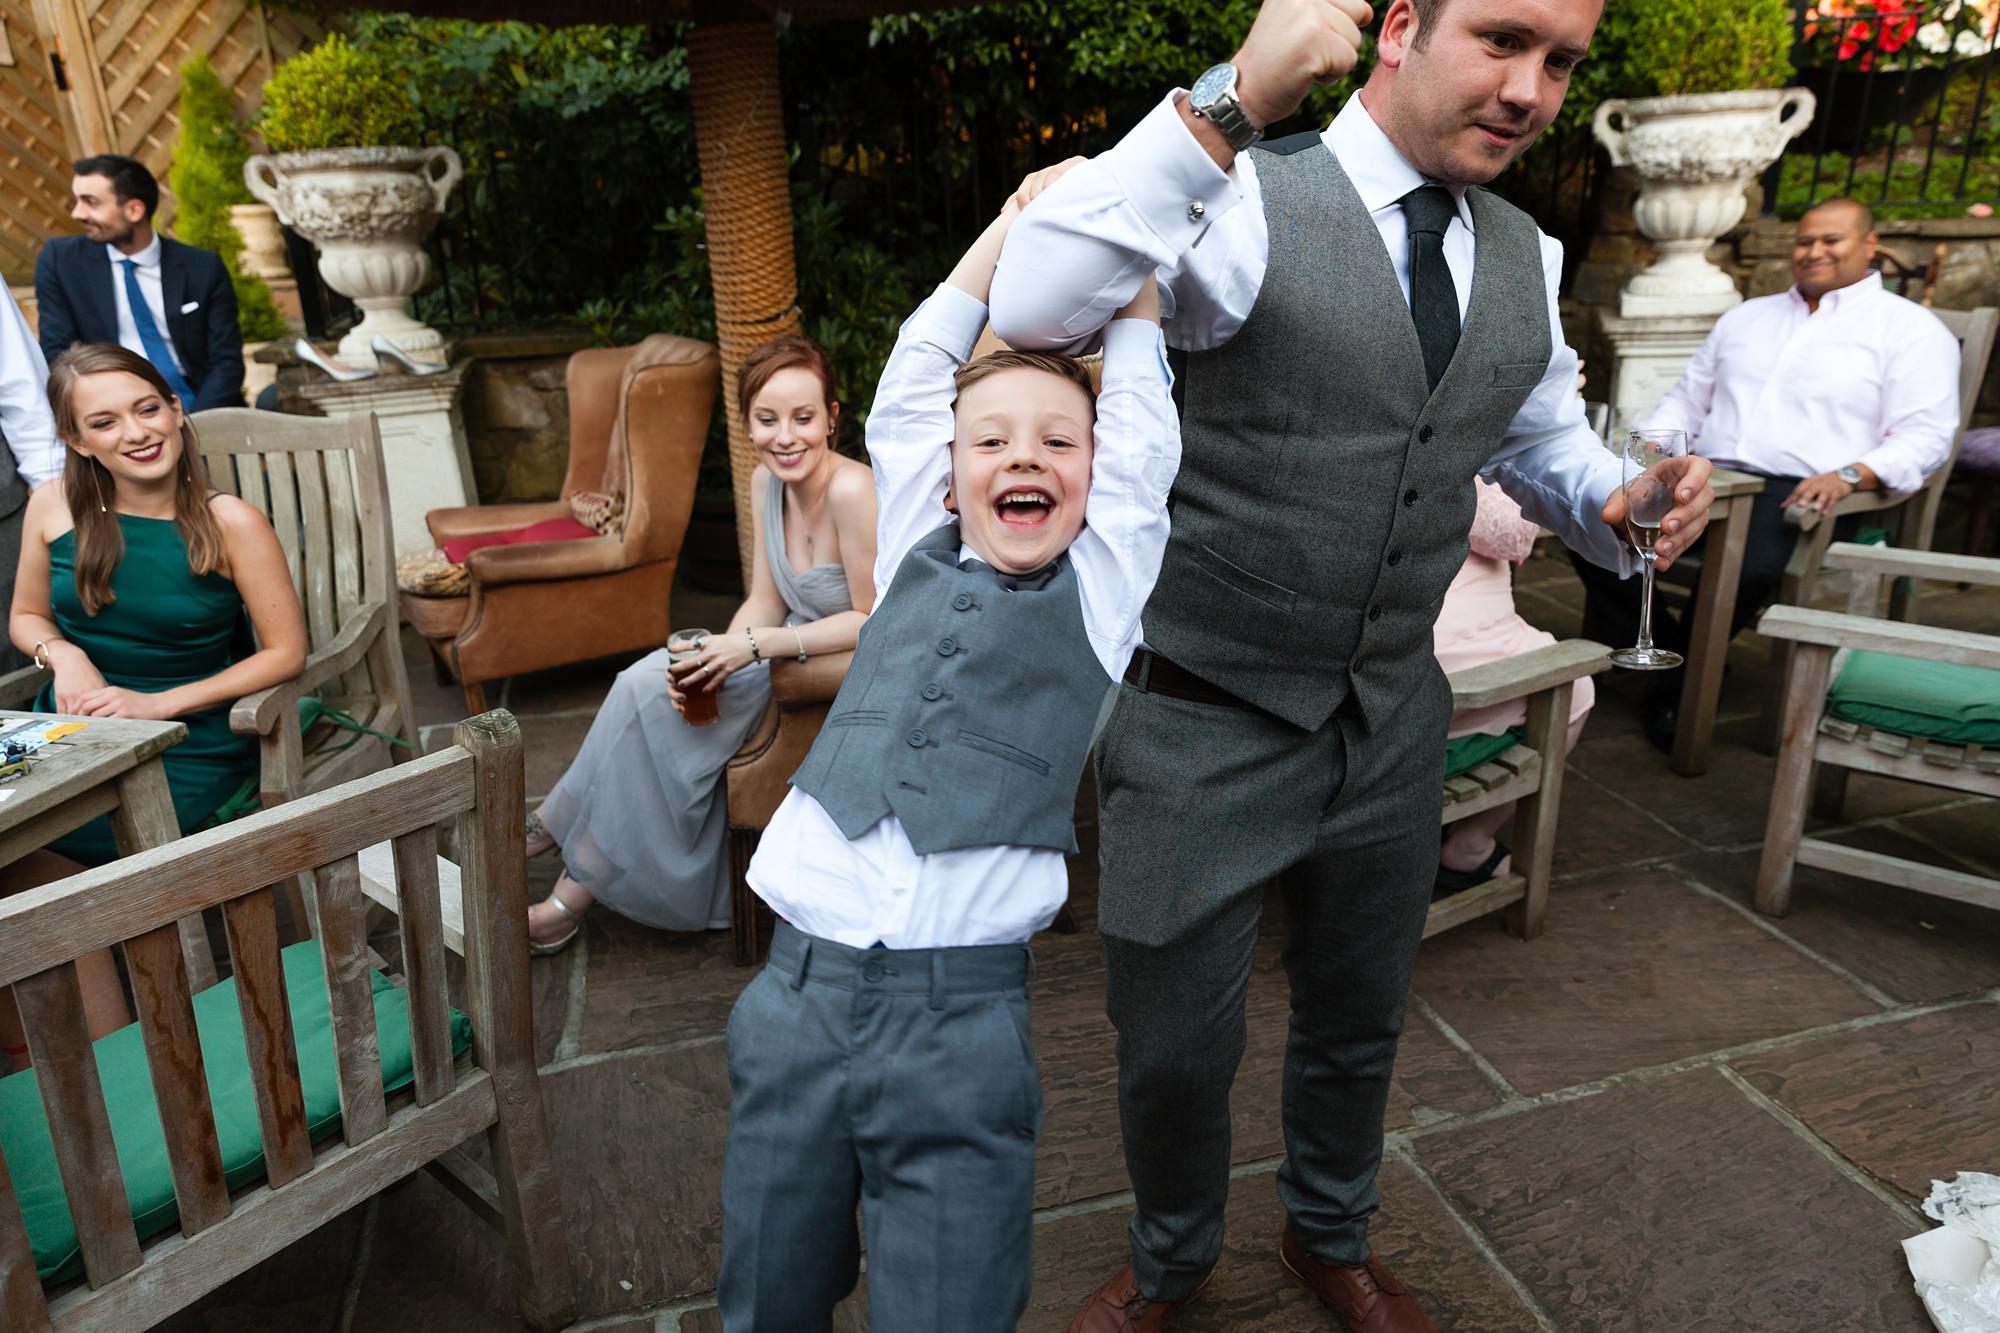 Child swinging around on groomsman's arm at Crab & Lobster wedding